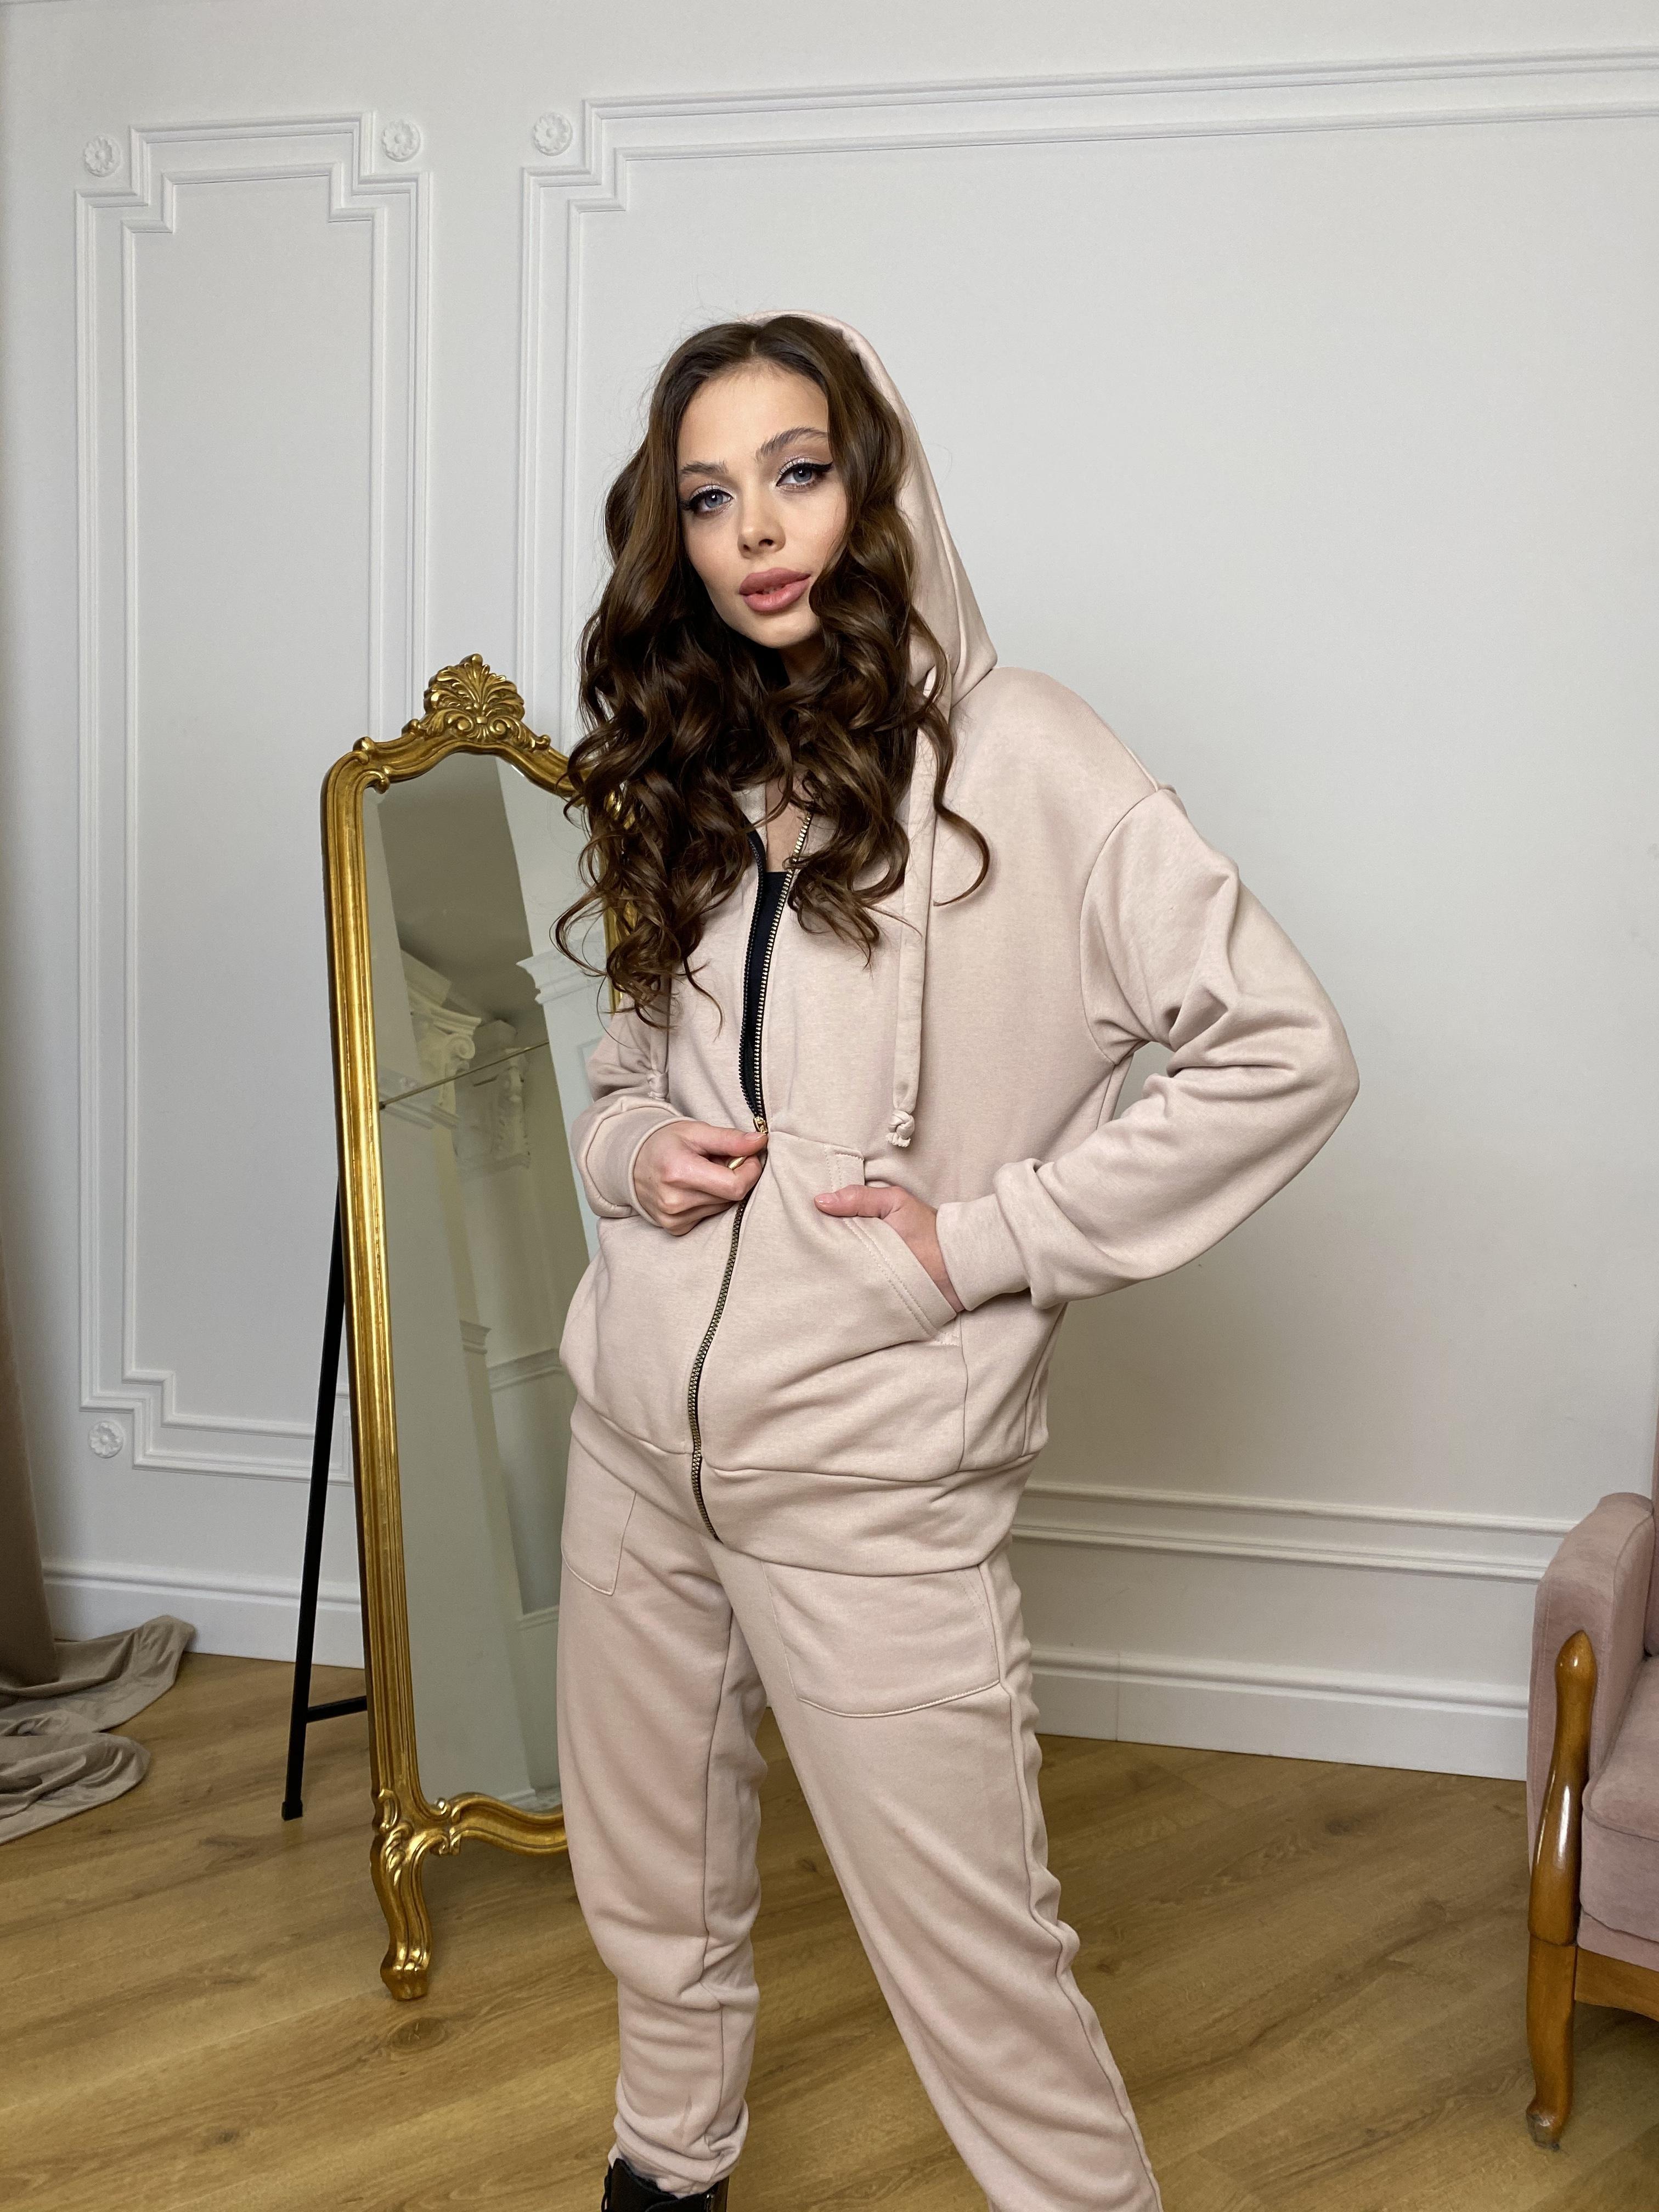 Брокер костюм  из 3х нитки  9634 АРТ. 45981 Цвет: Бежевый - фото 8, интернет магазин tm-modus.ru